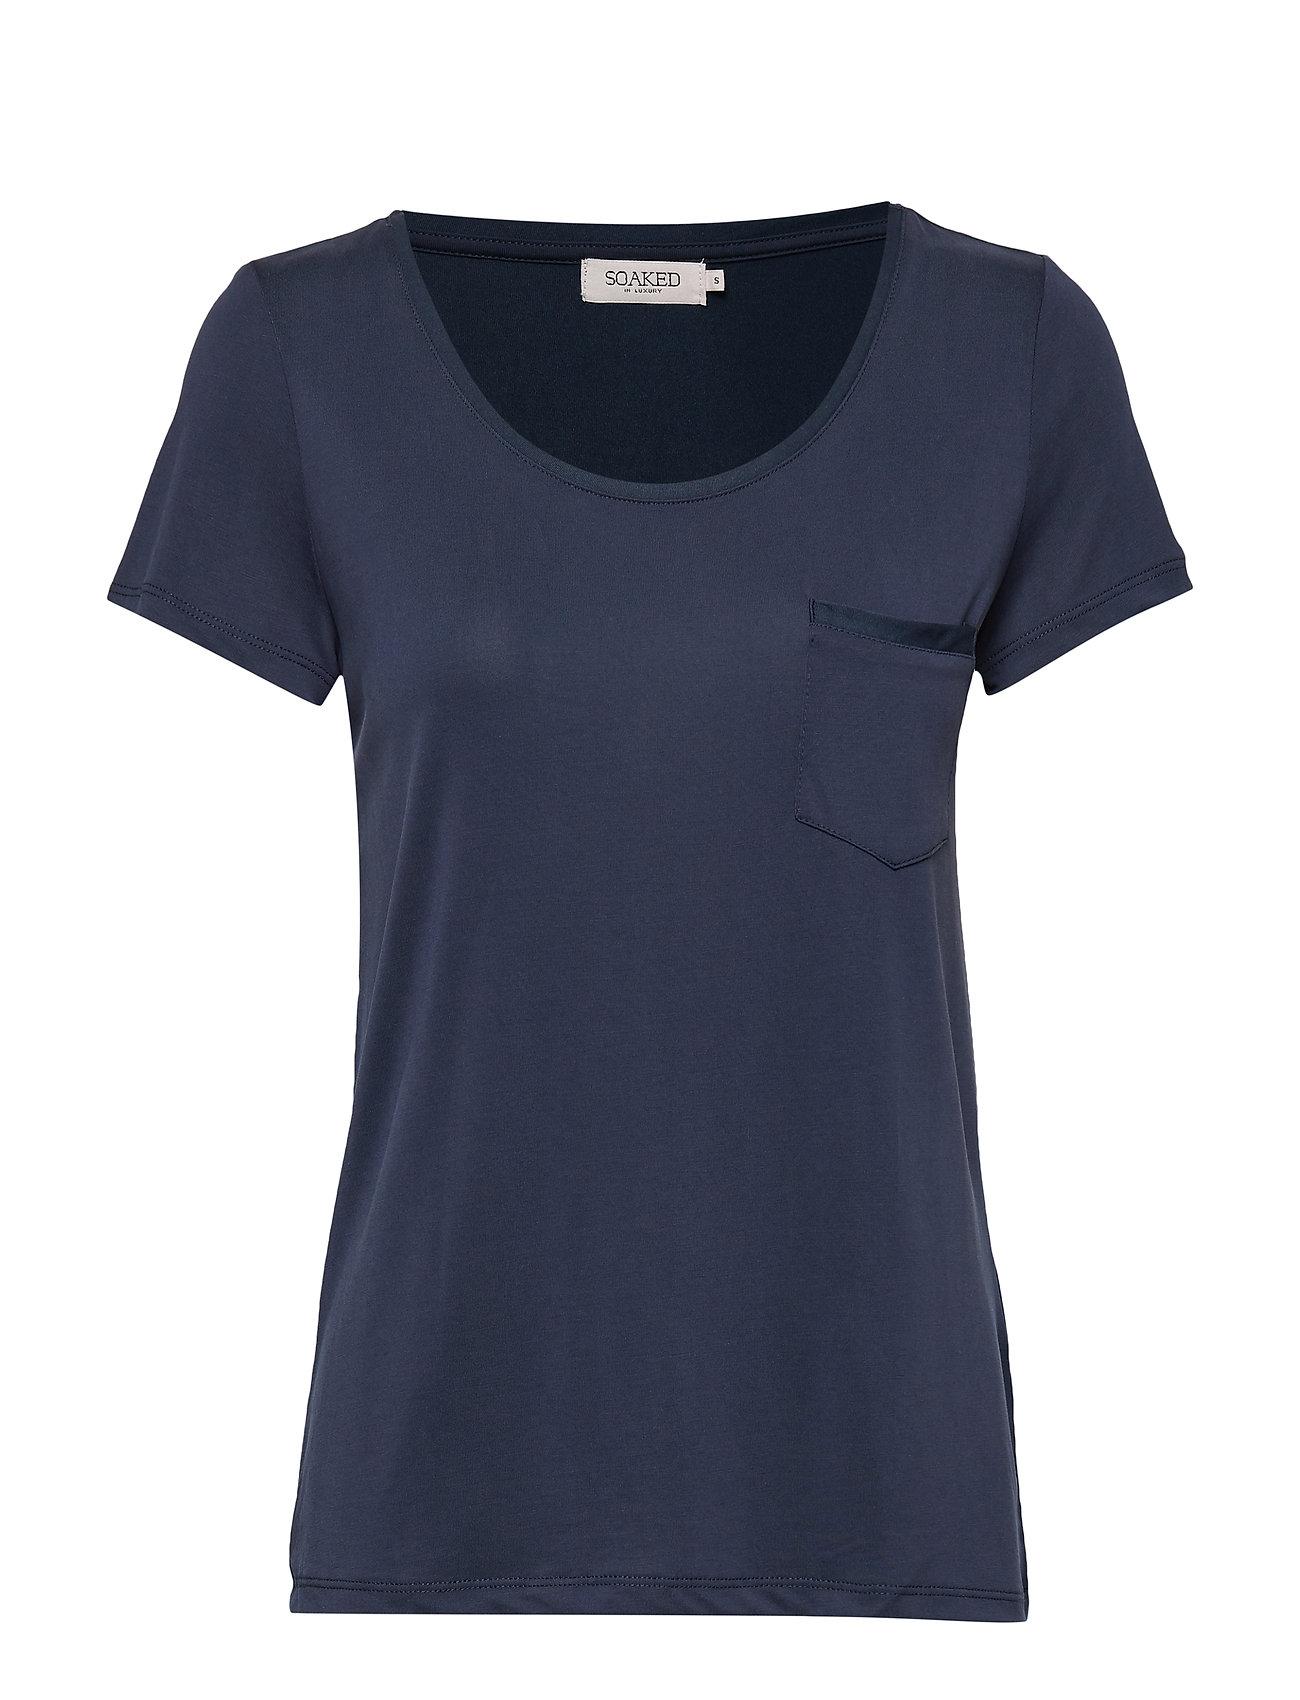 Image of Slcolumbine Tee T-shirt Top Blå Soaked In Luxury (3191978715)